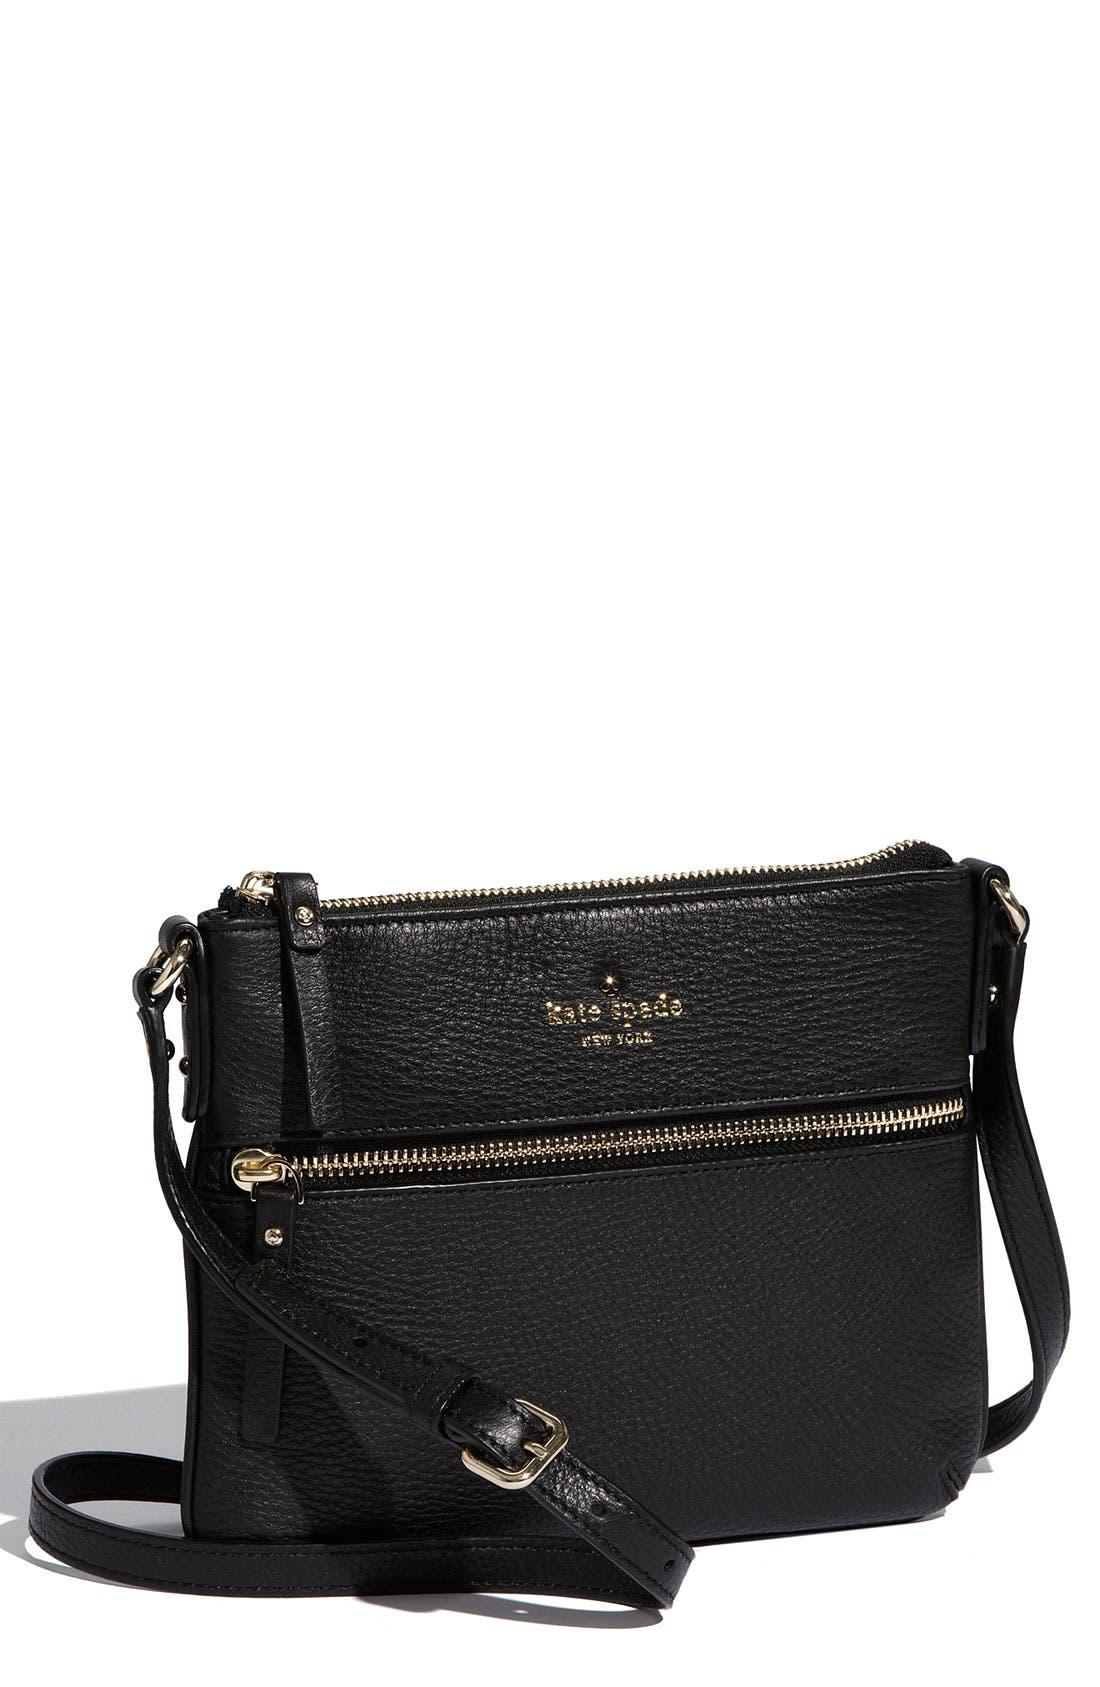 KATE SPADE NEW YORK 'cobble hill - tenley' crossbody bag, Main, color, 001